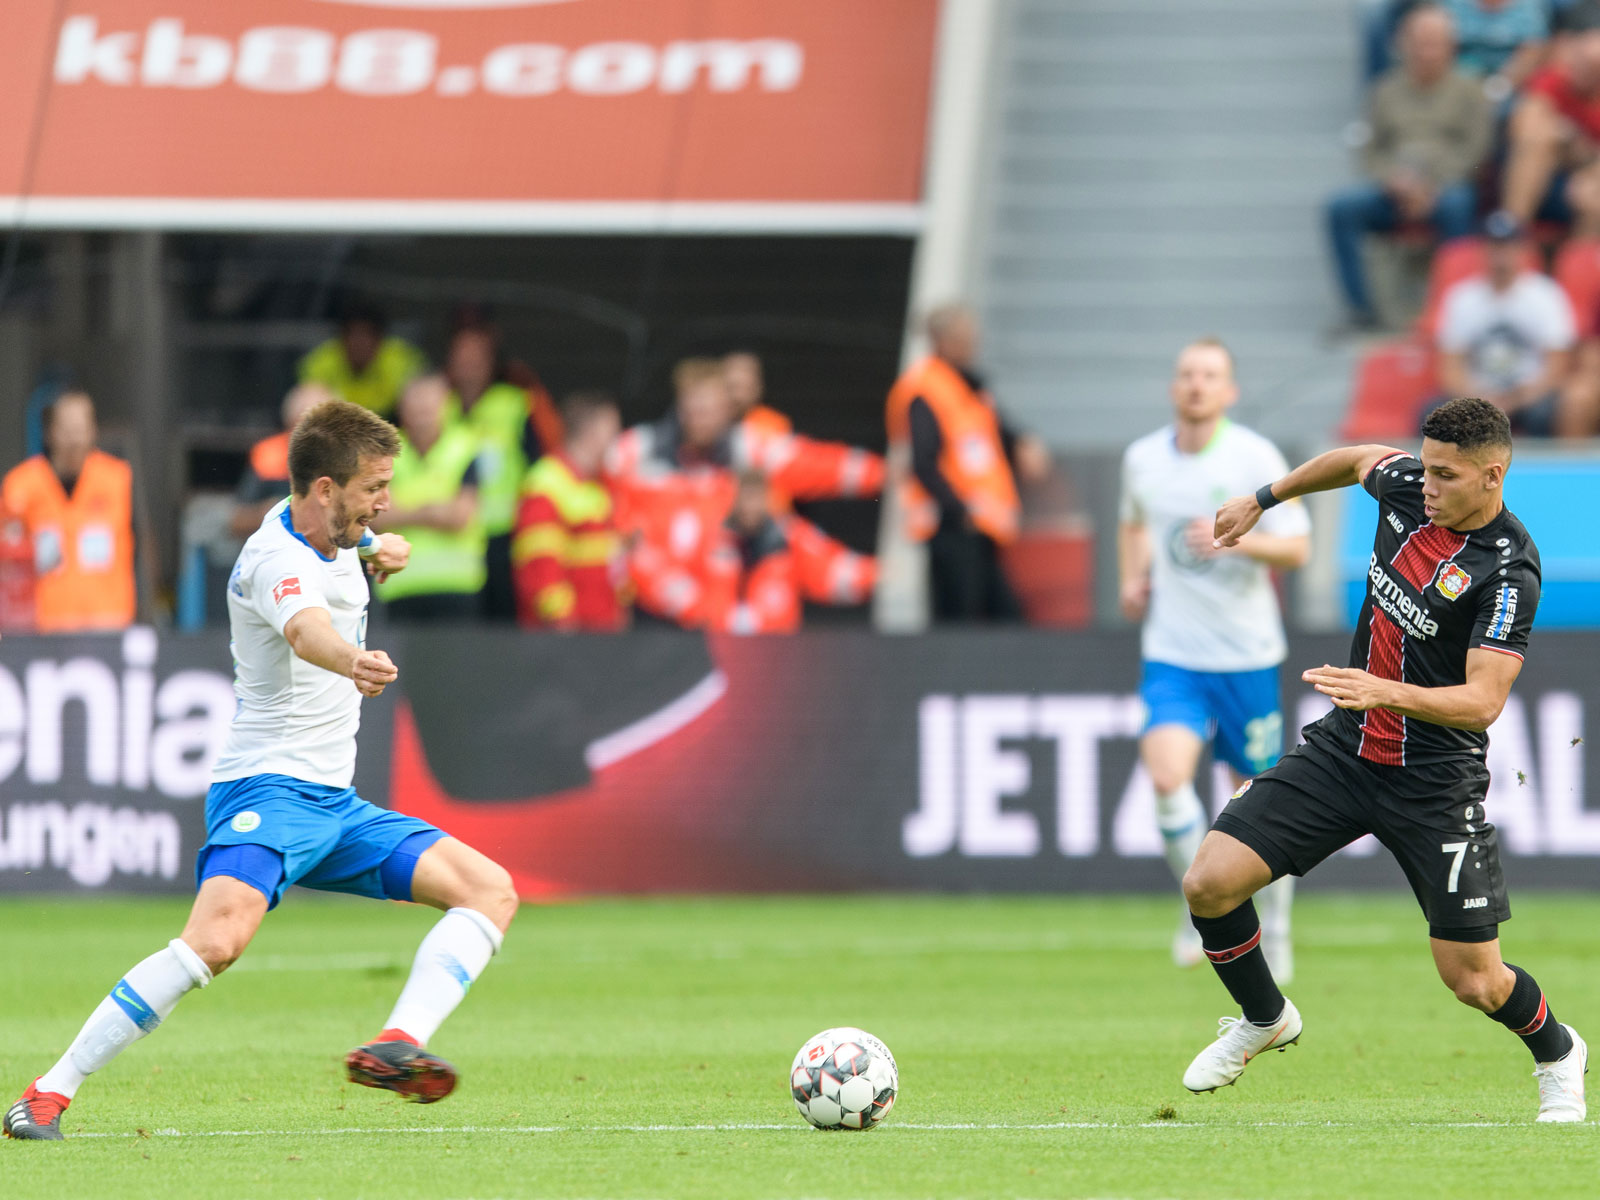 Brazilian Paulinho is Bayer Leverkusen's most recent young star acquisition